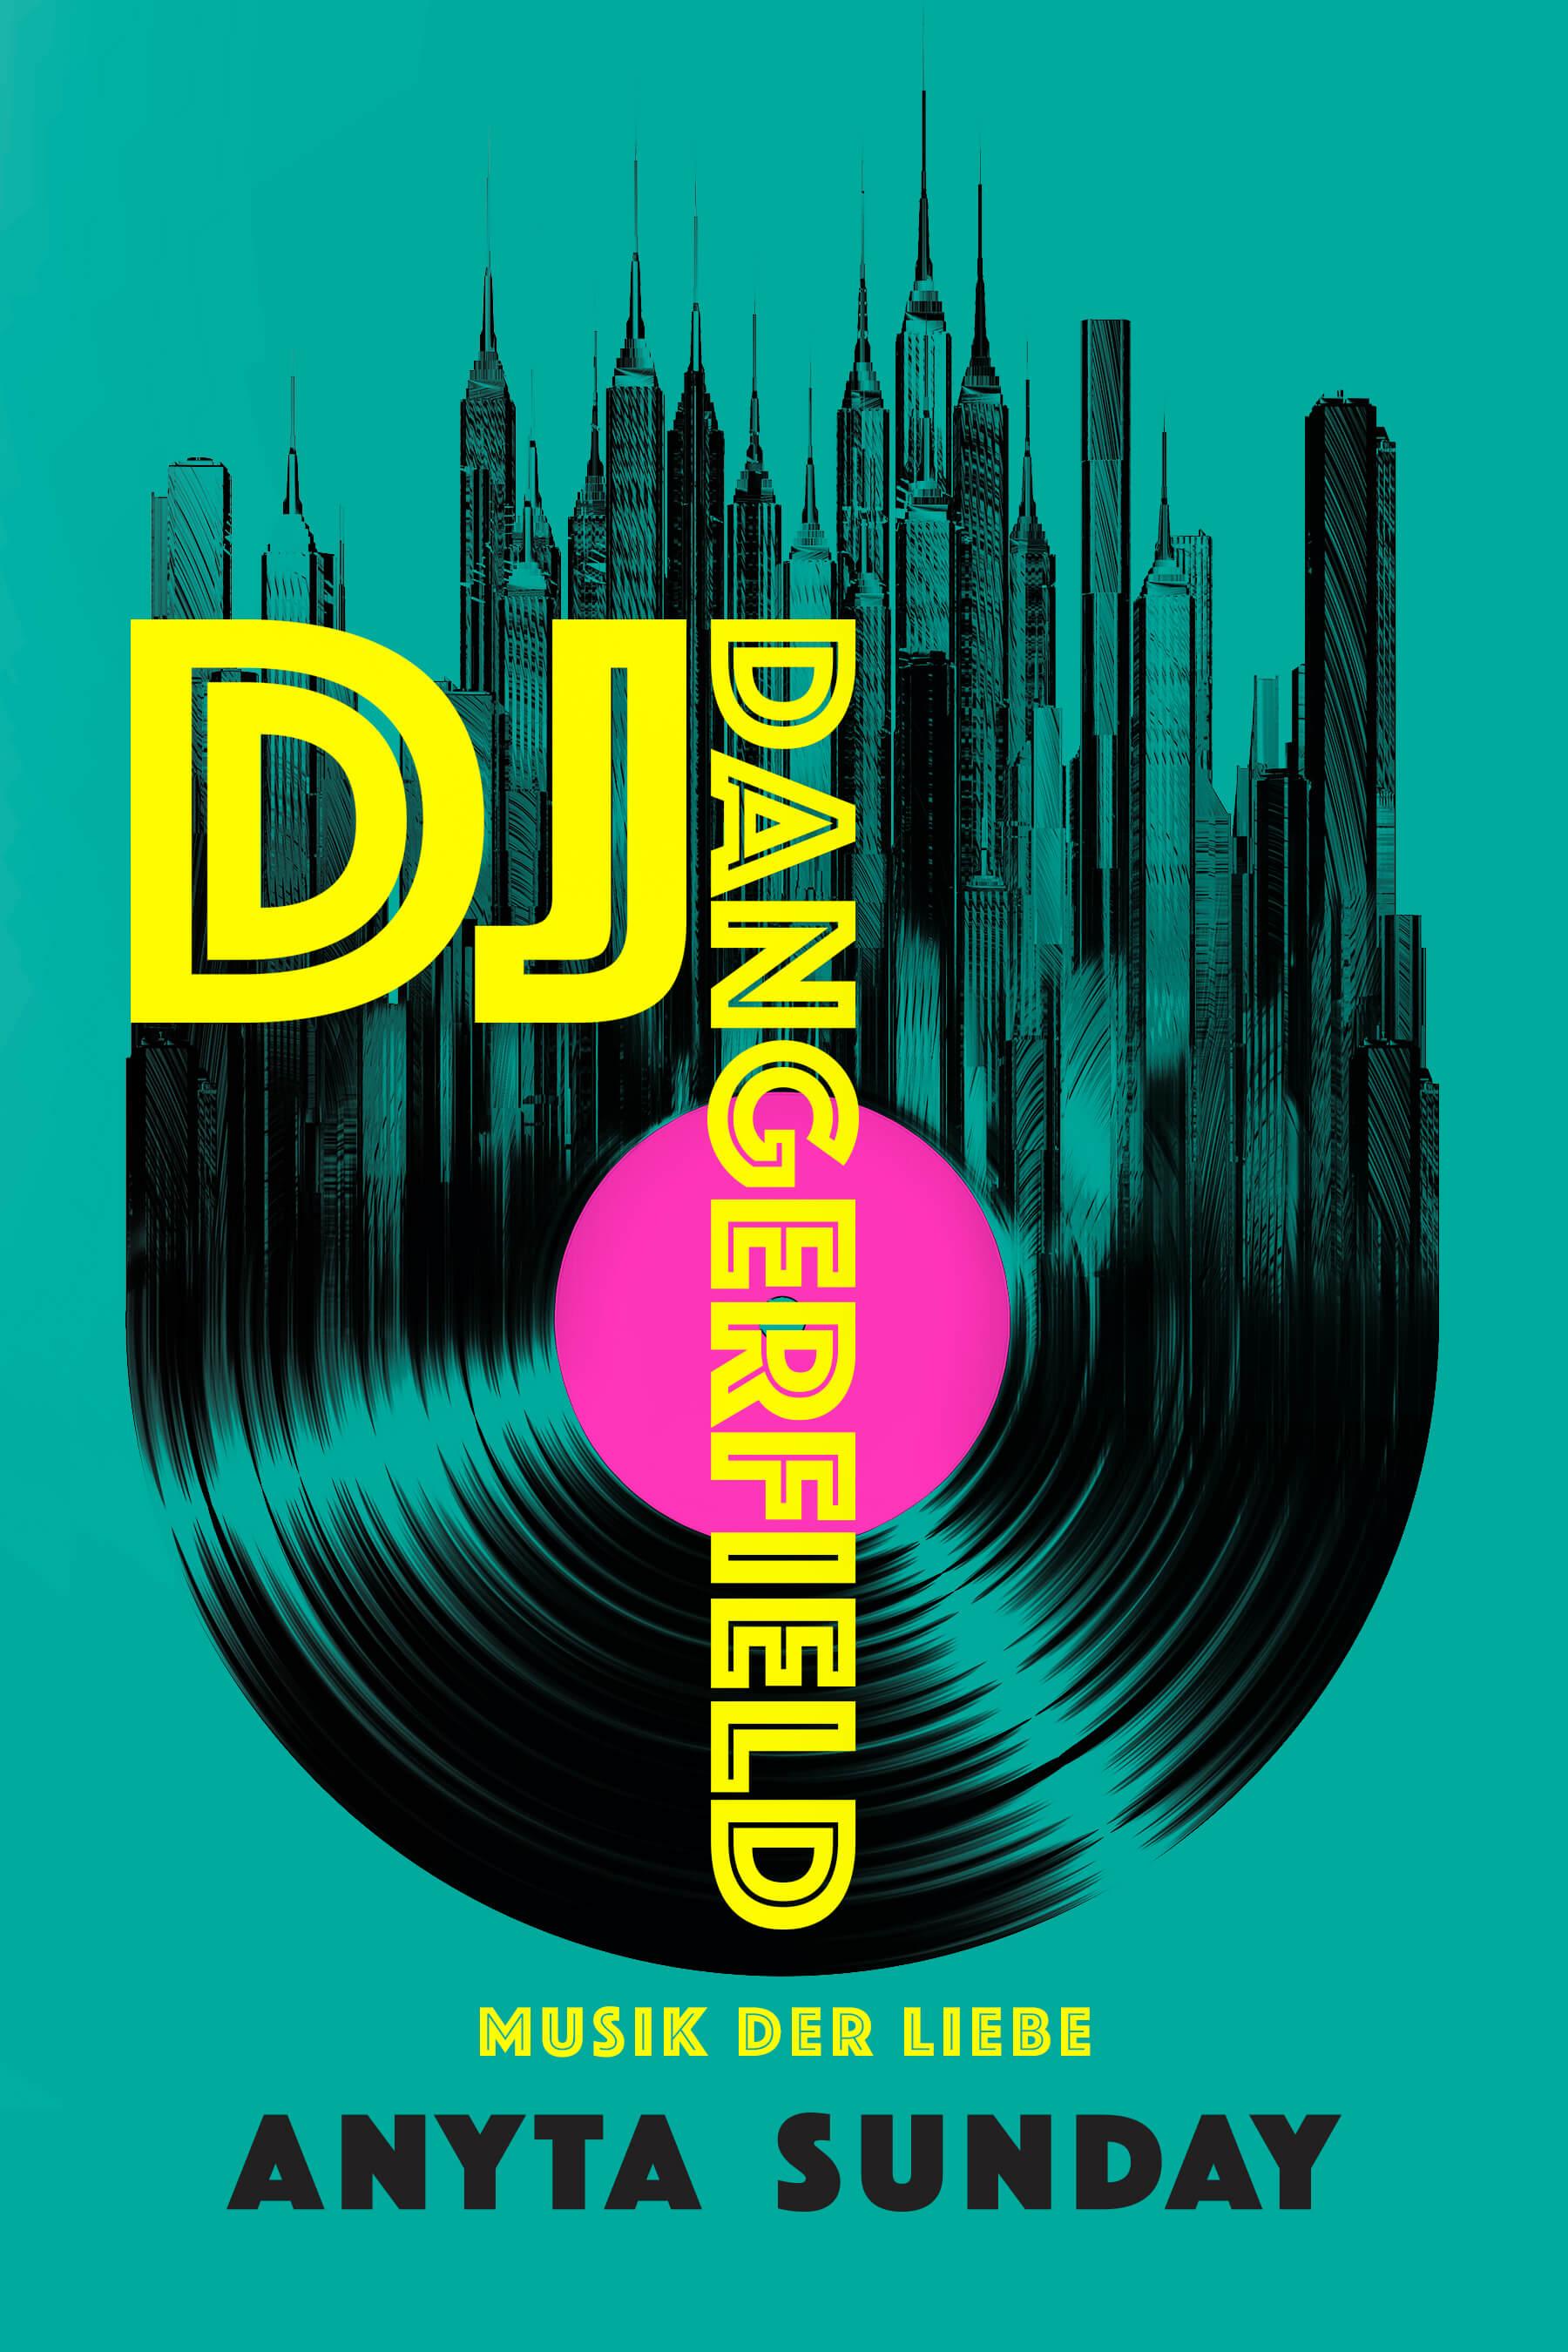 DJ Dangerfield Musik der Liebe Anyta Sunday